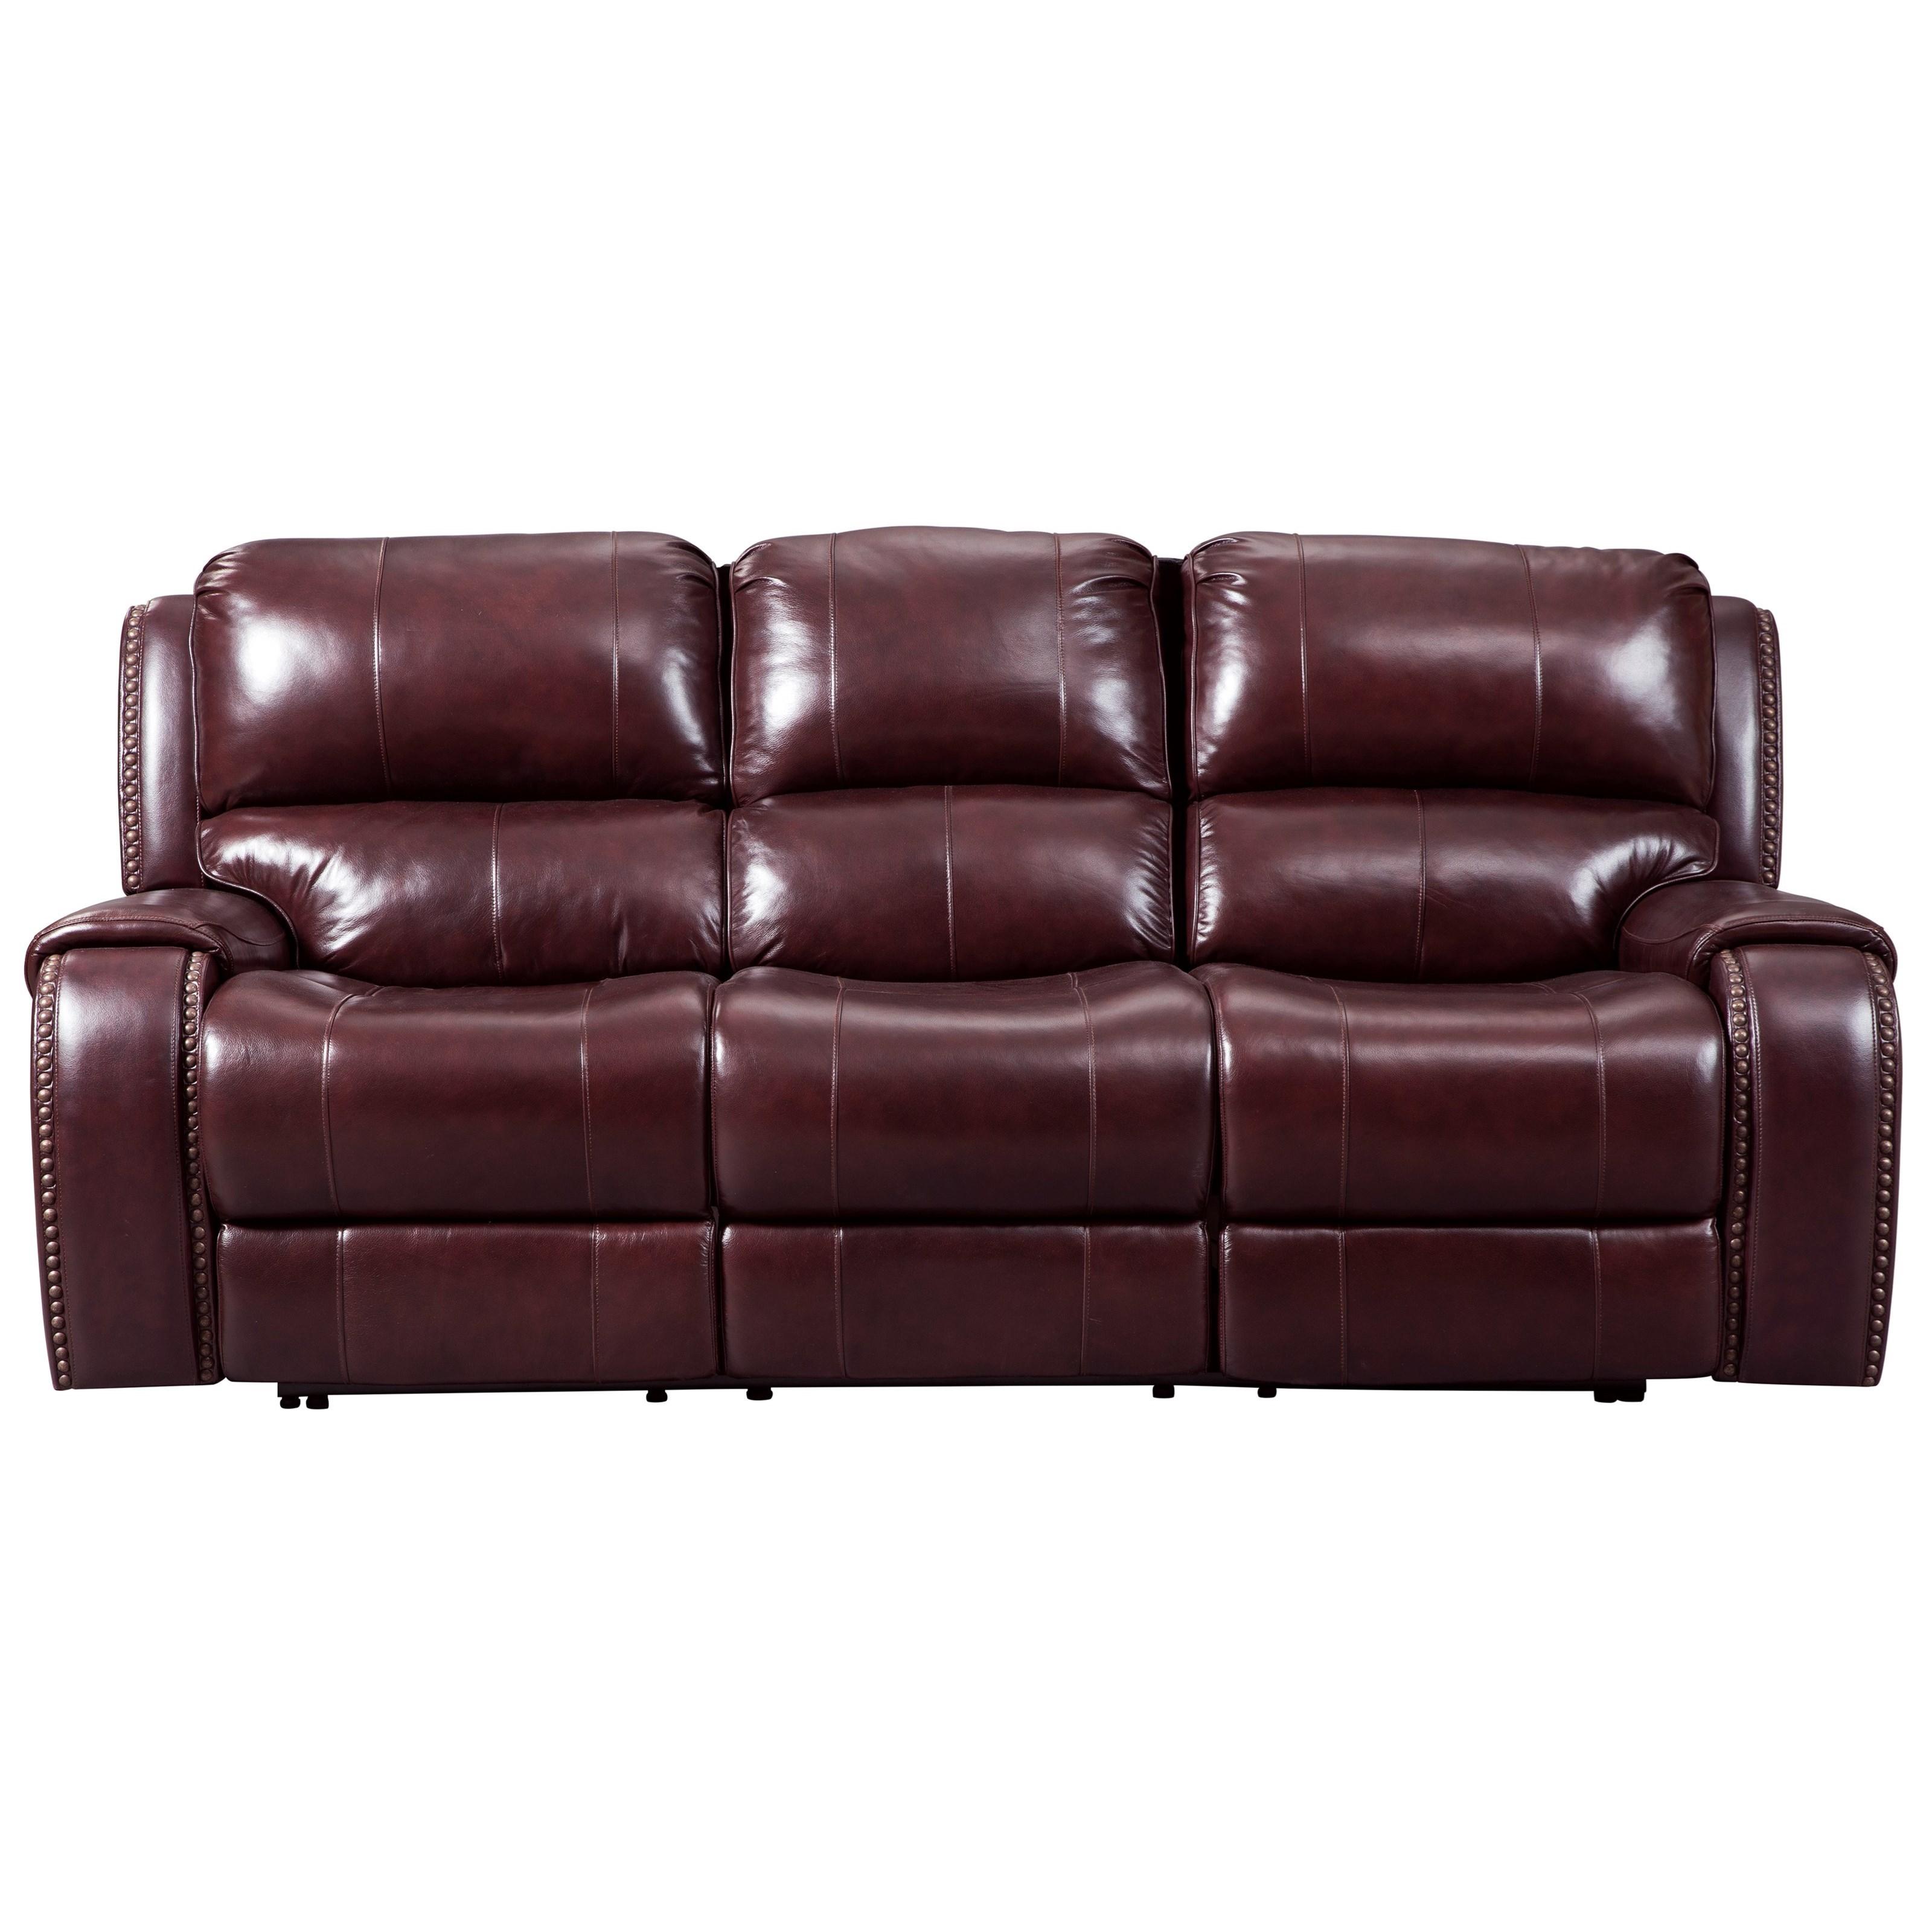 Signature Design By Ashley Gilmanton Power Reclining Sofa W/ Adjustable  Headrest